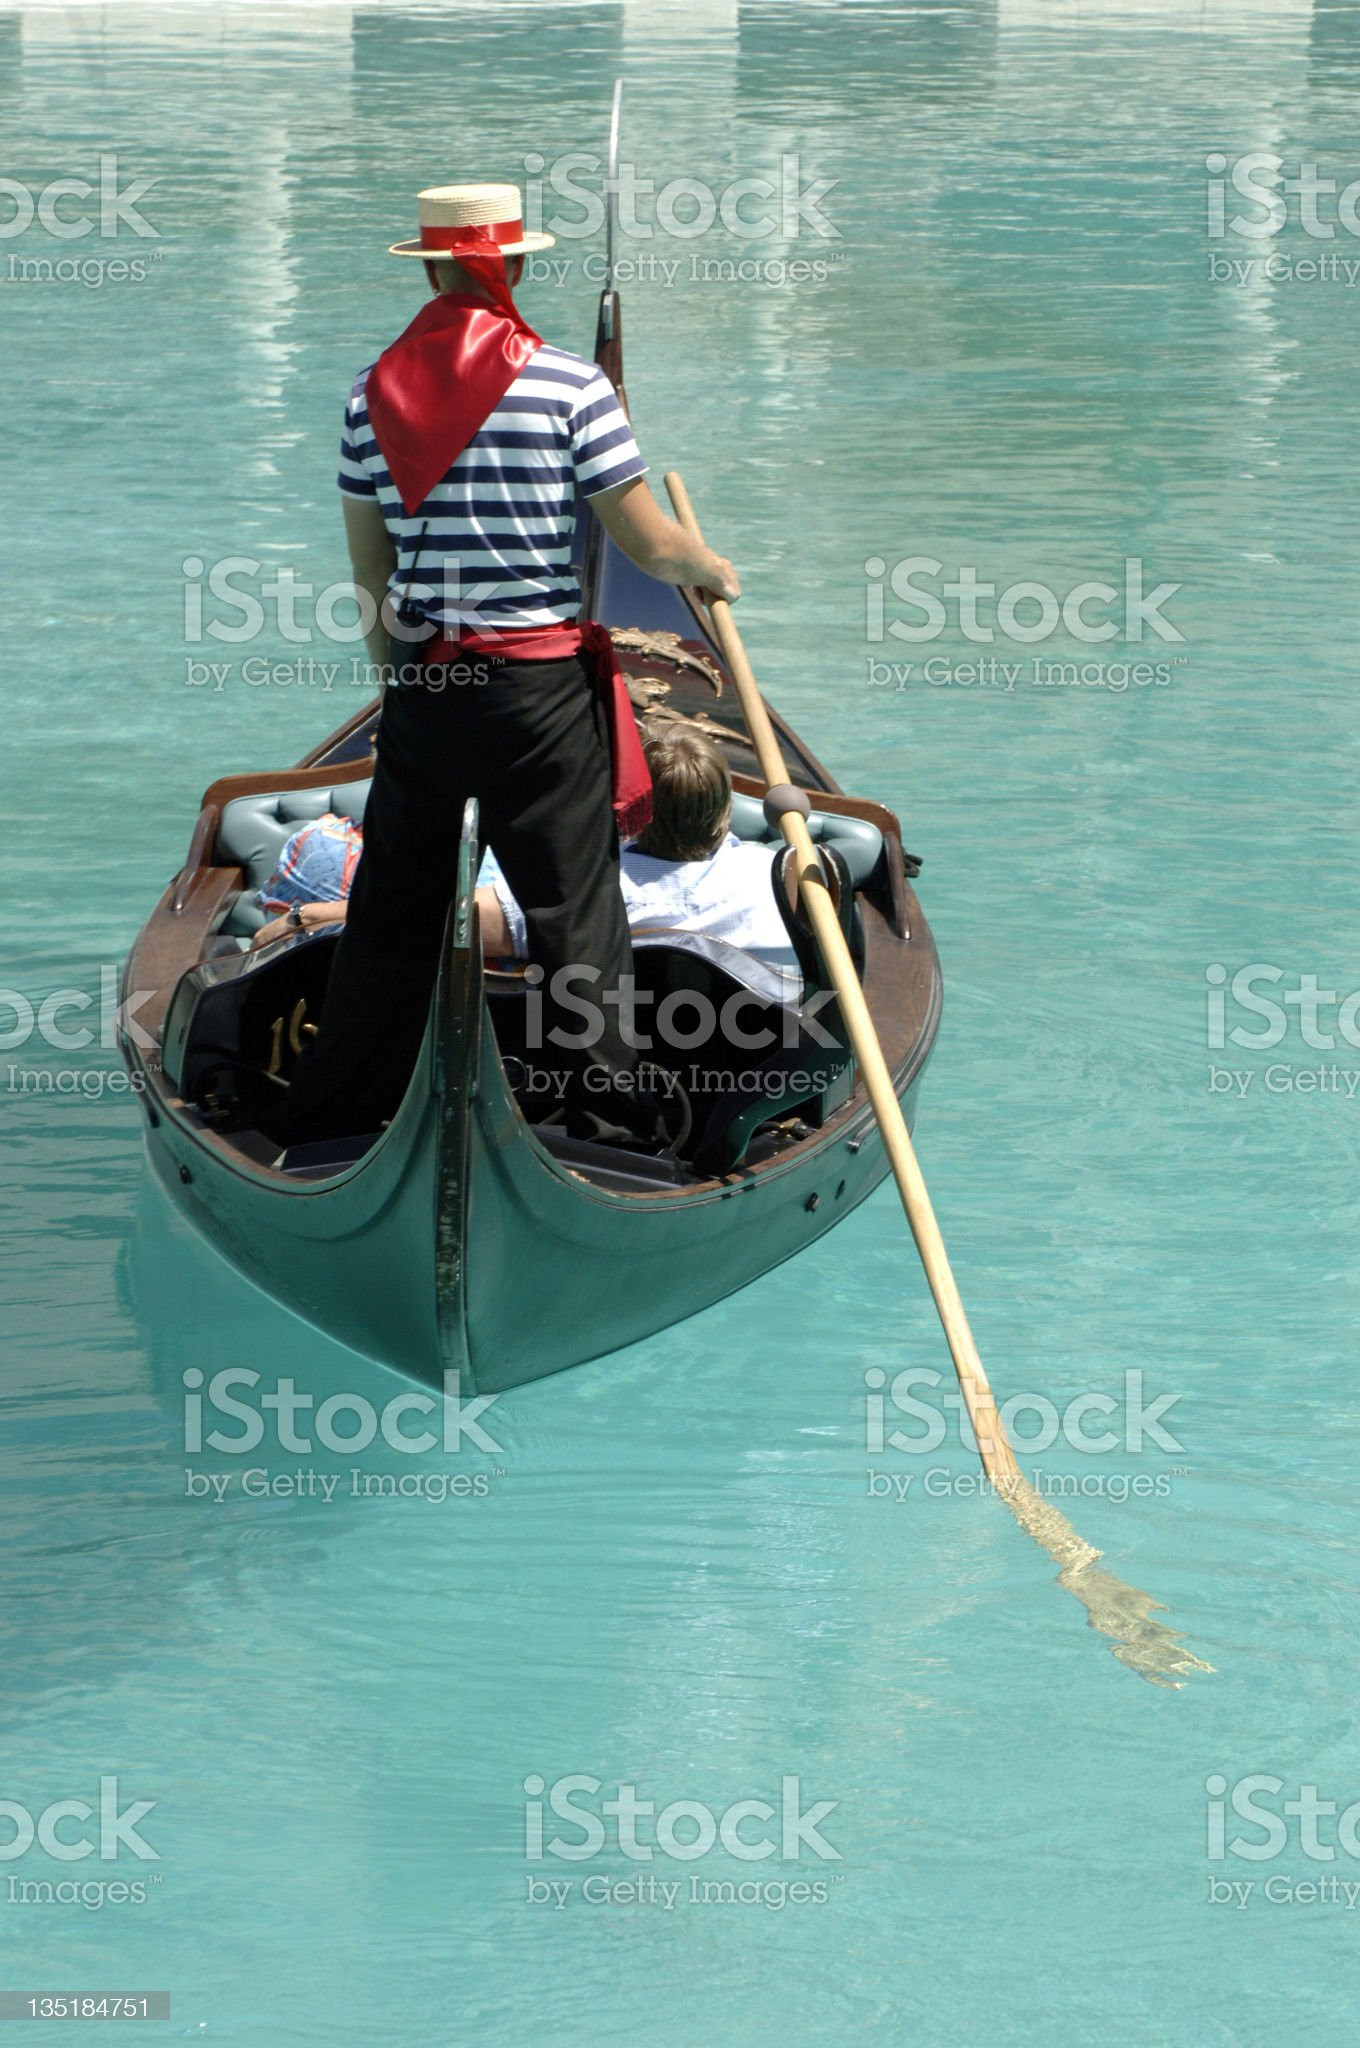 Gondola ride. royalty-free stock photo